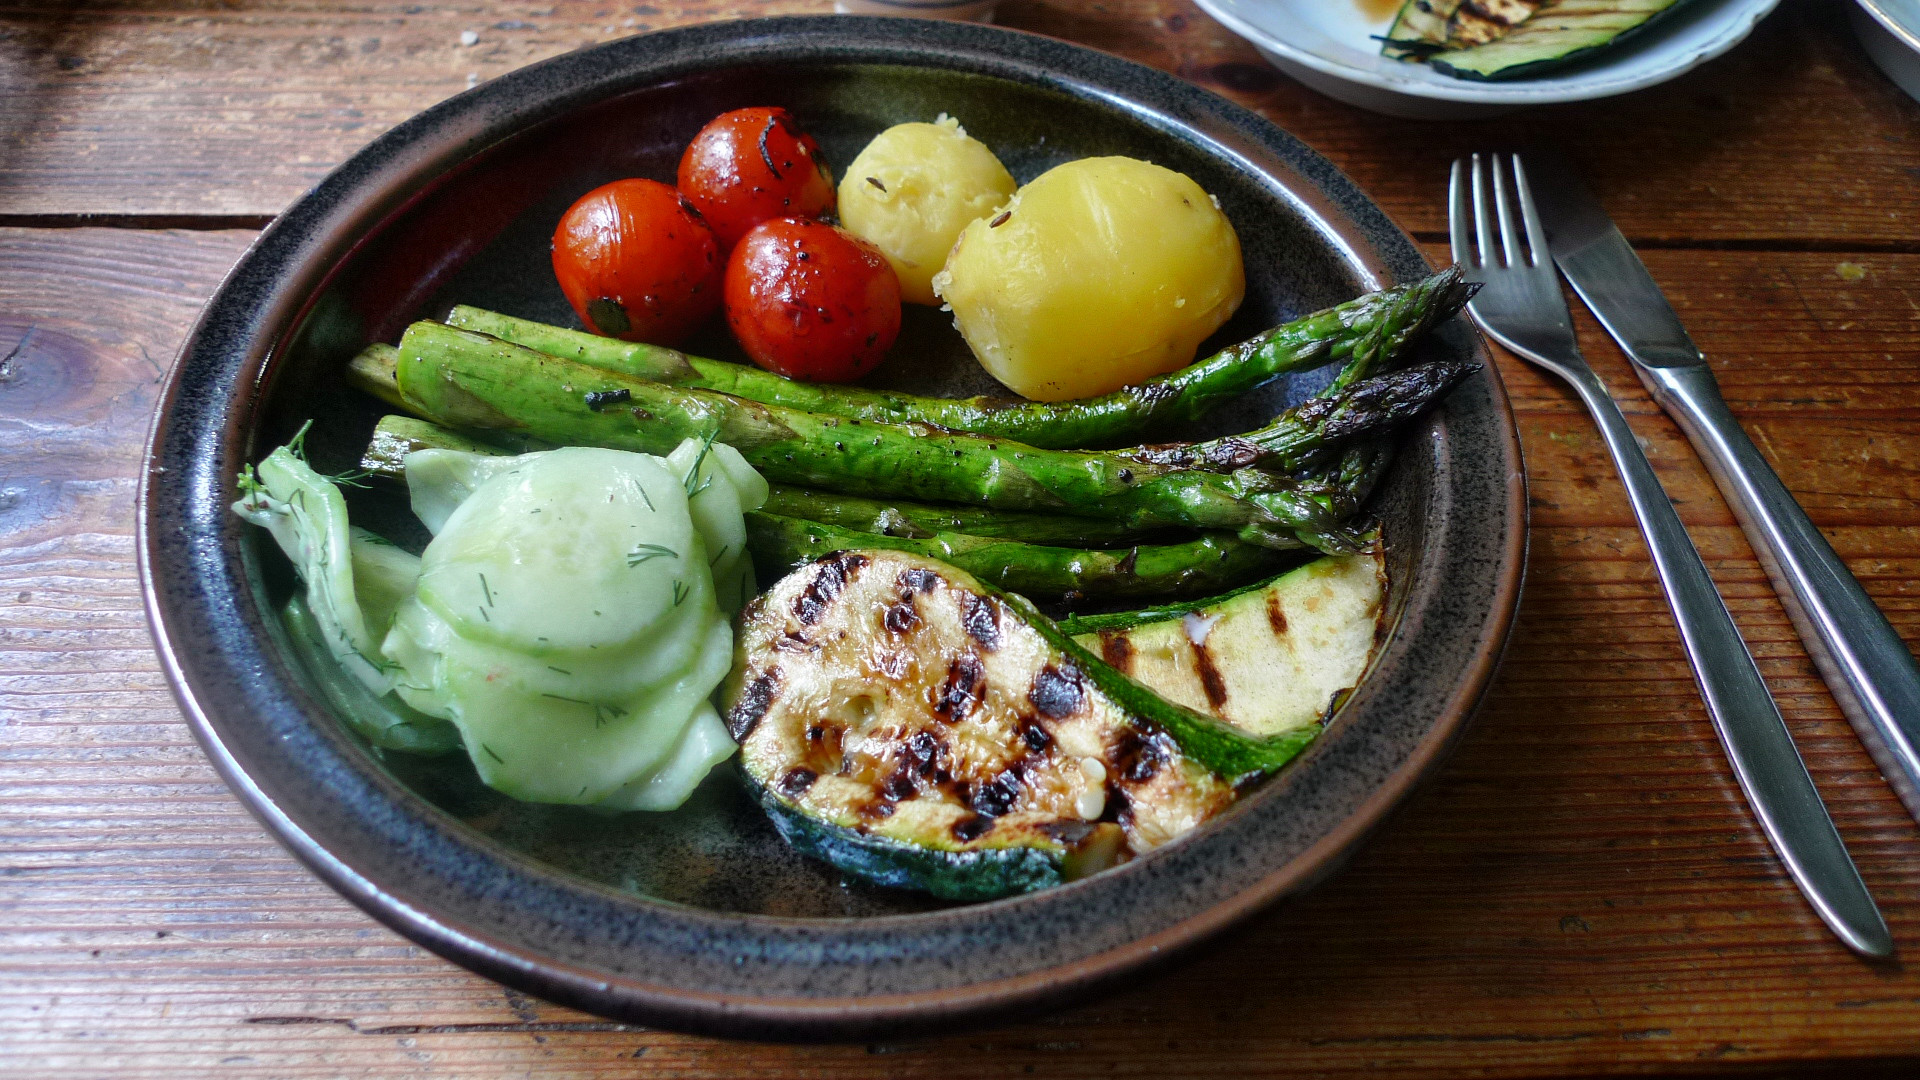 Spargel,Zucchini,Tomate,Gurkensalat,Kartoffeln -3.5.15   (12)